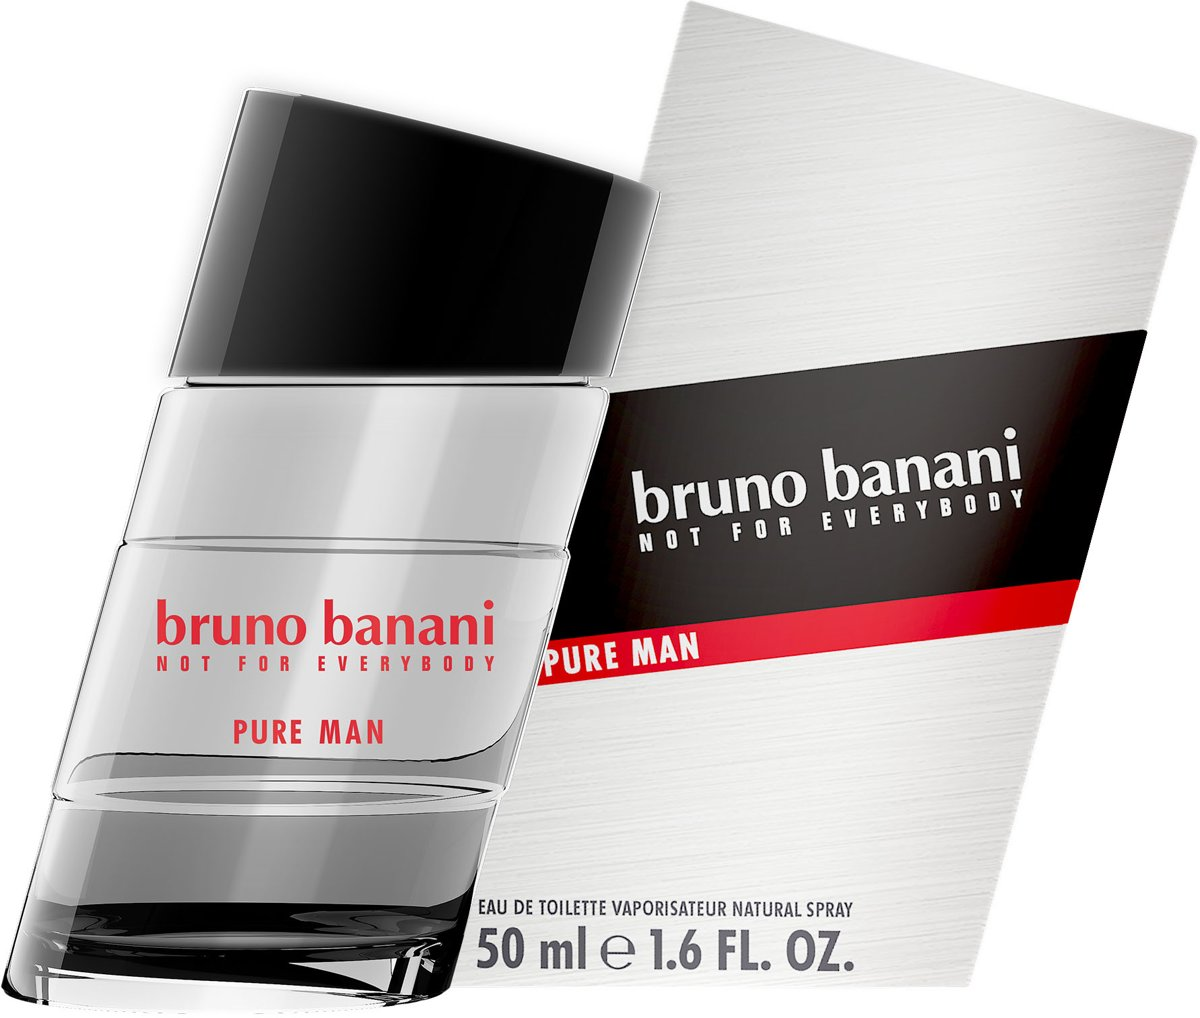 the latest 01e2f 609f1 bol.com | Bruno Banani artikelen kopen? Alle artikelen online